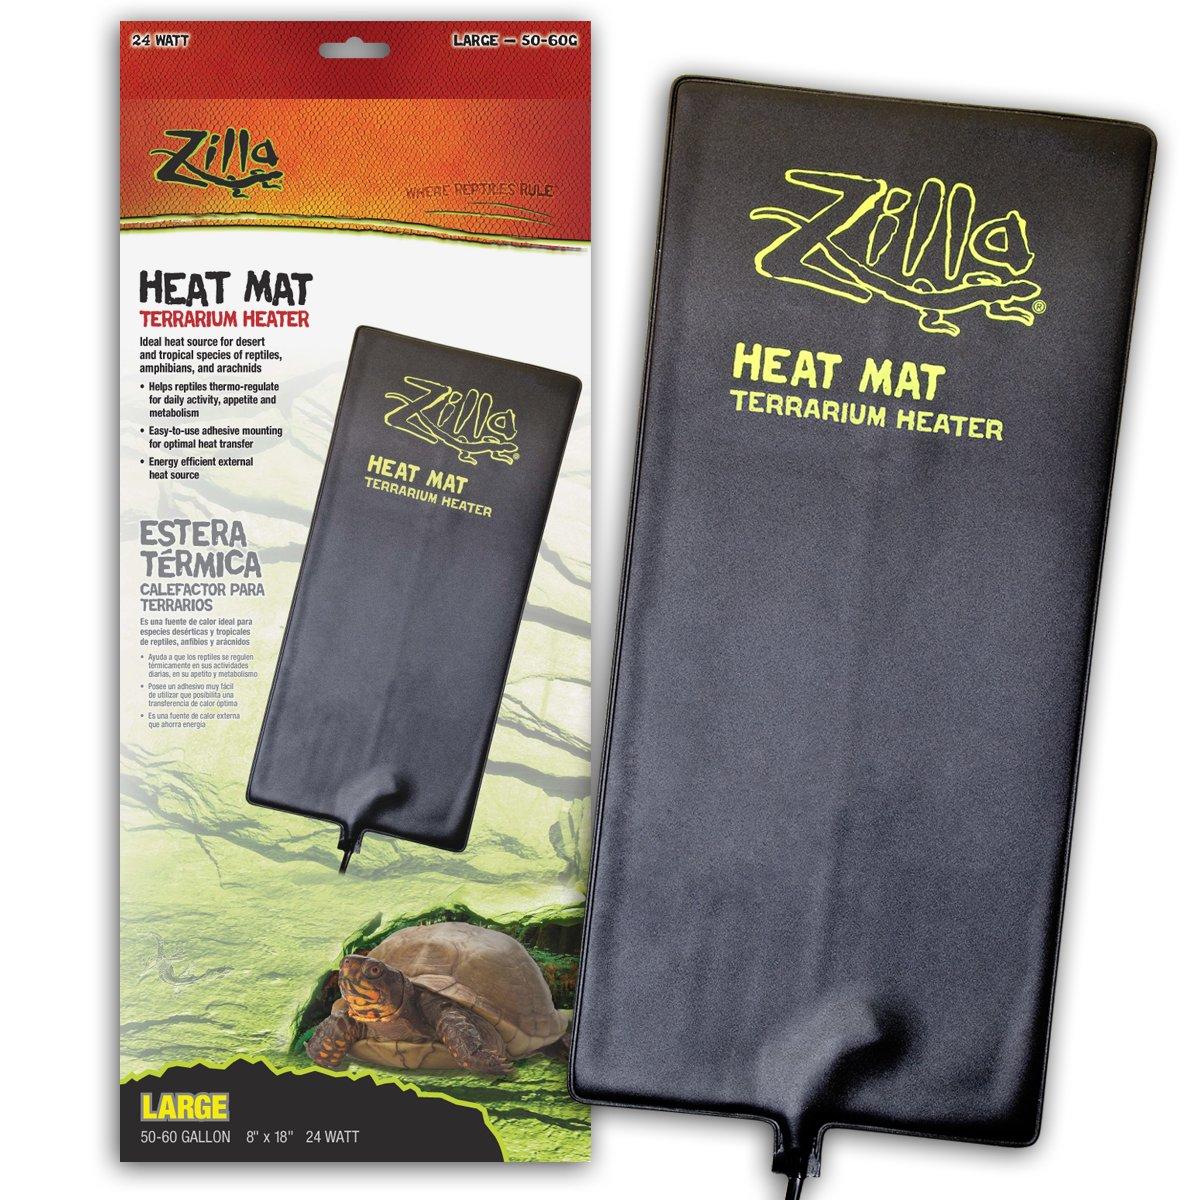 Zilla Reptile Terrarium Heat Mats, Large, 24 Watt